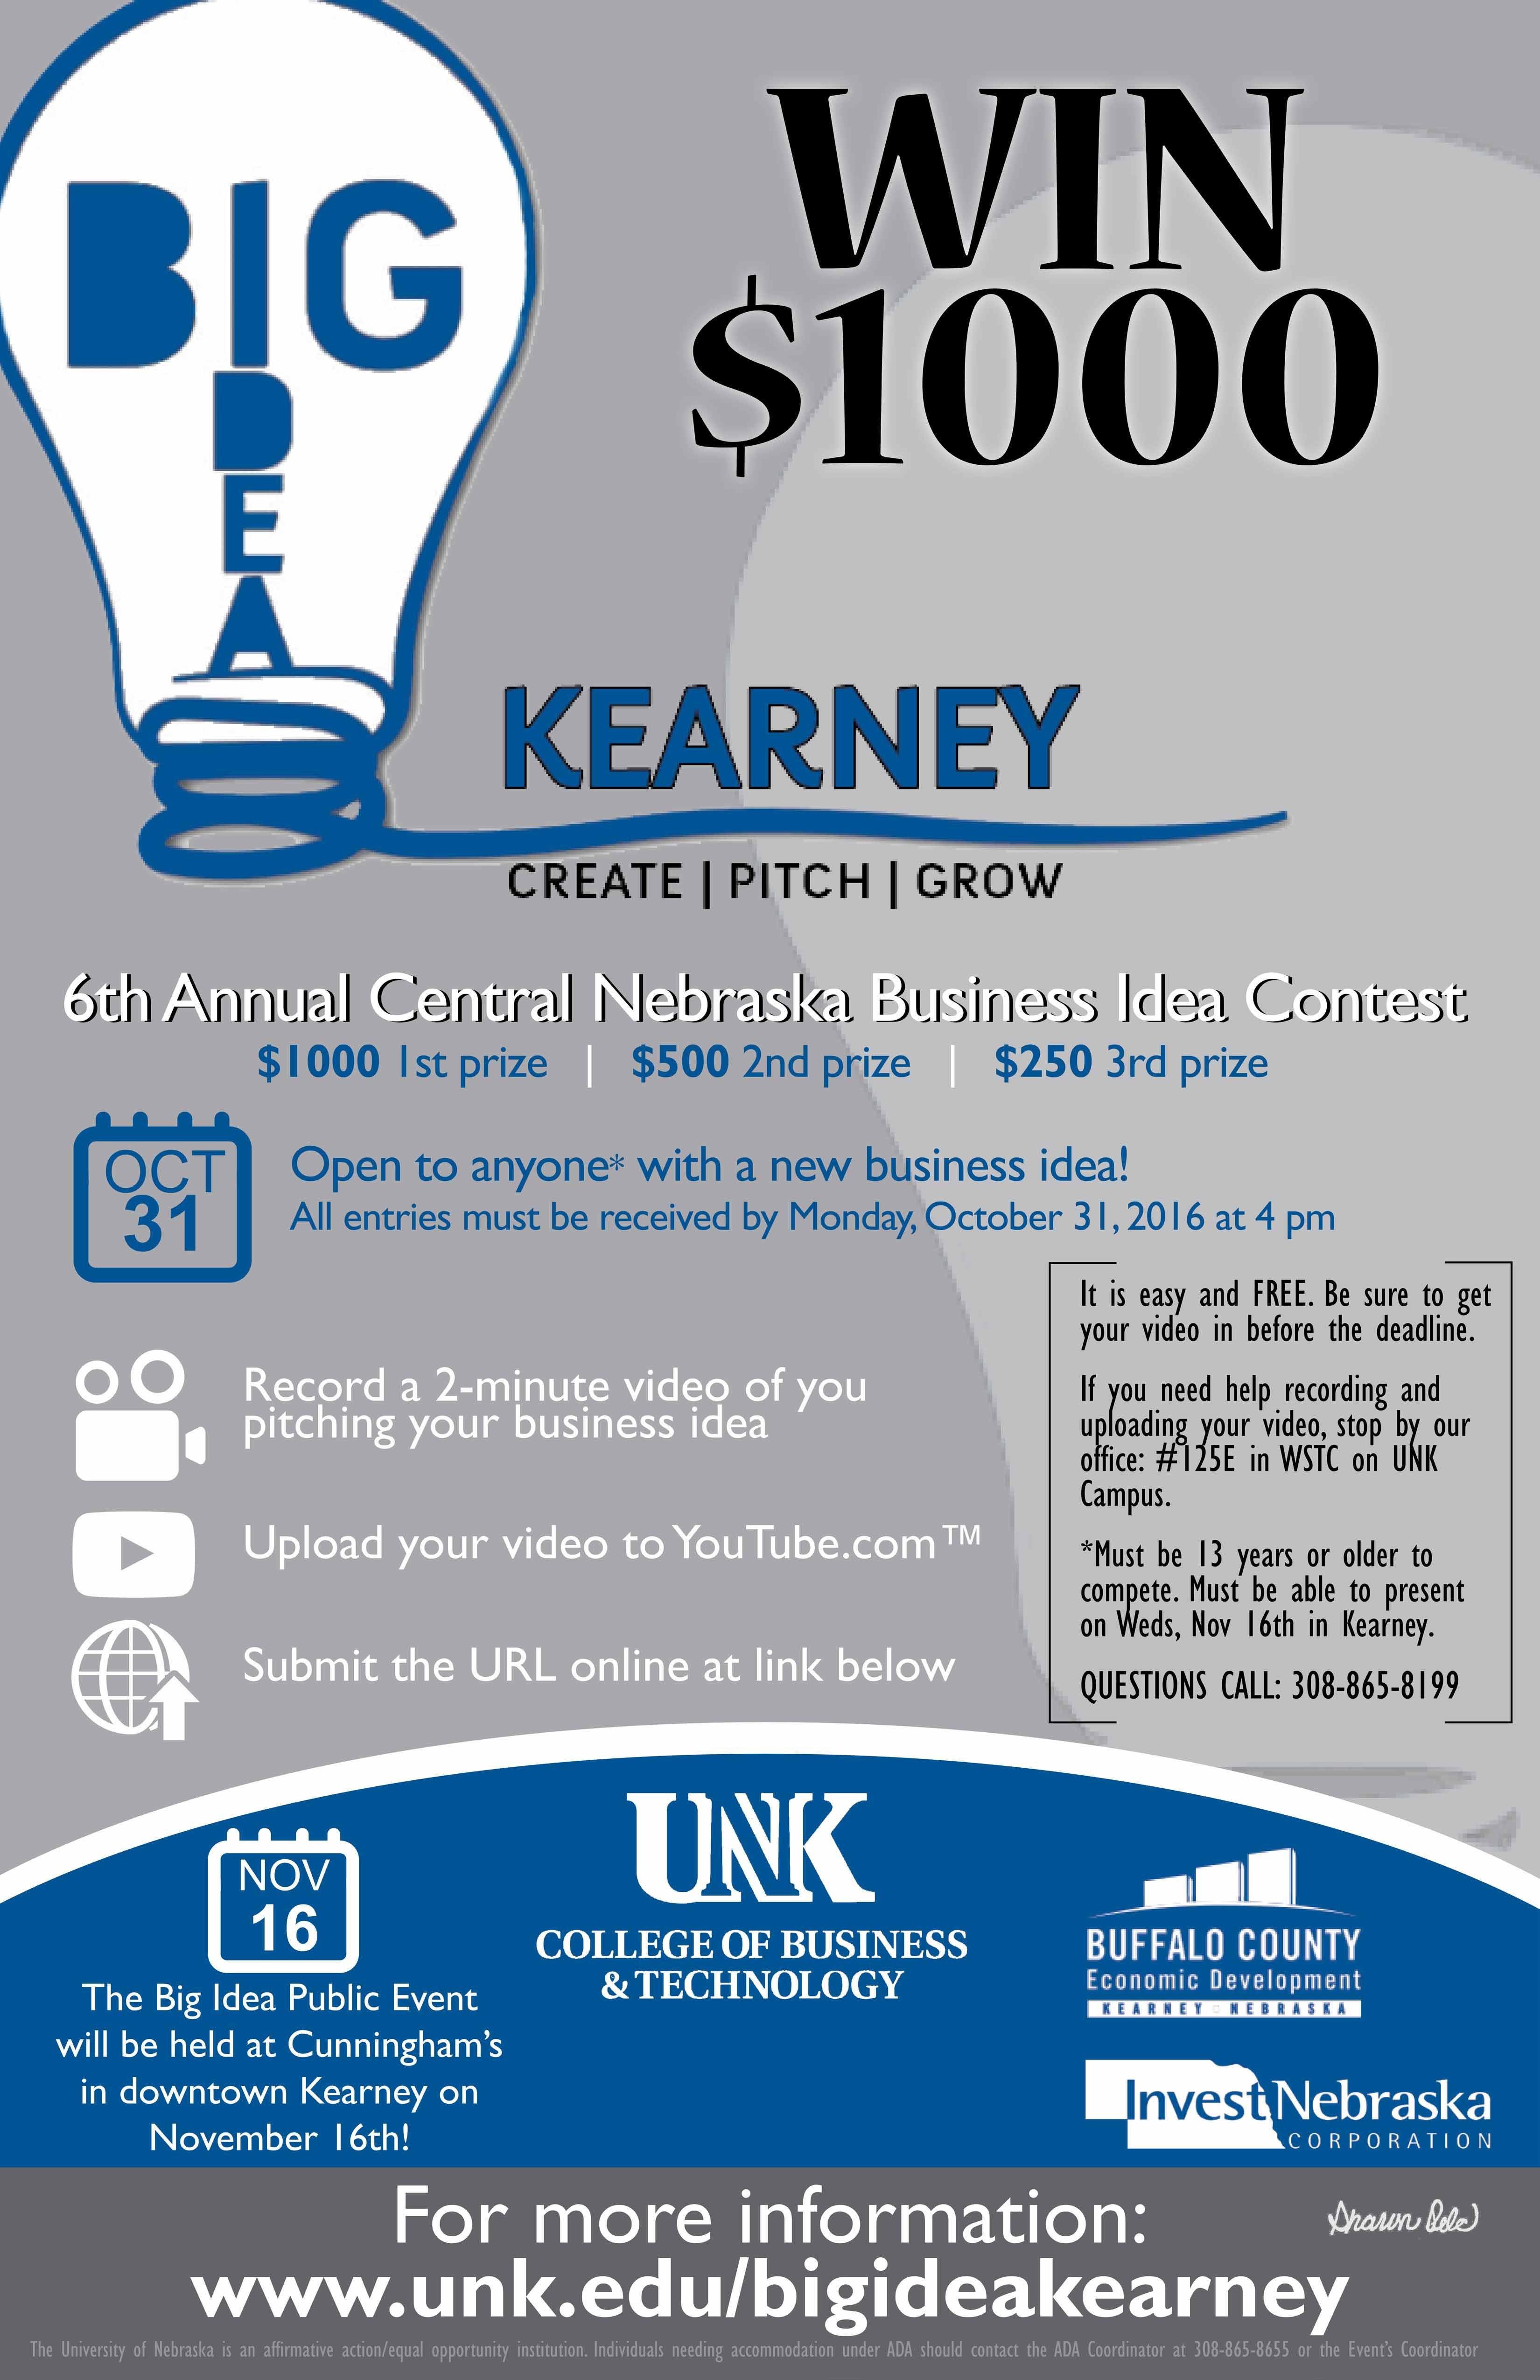 Big-Idea-Kearney